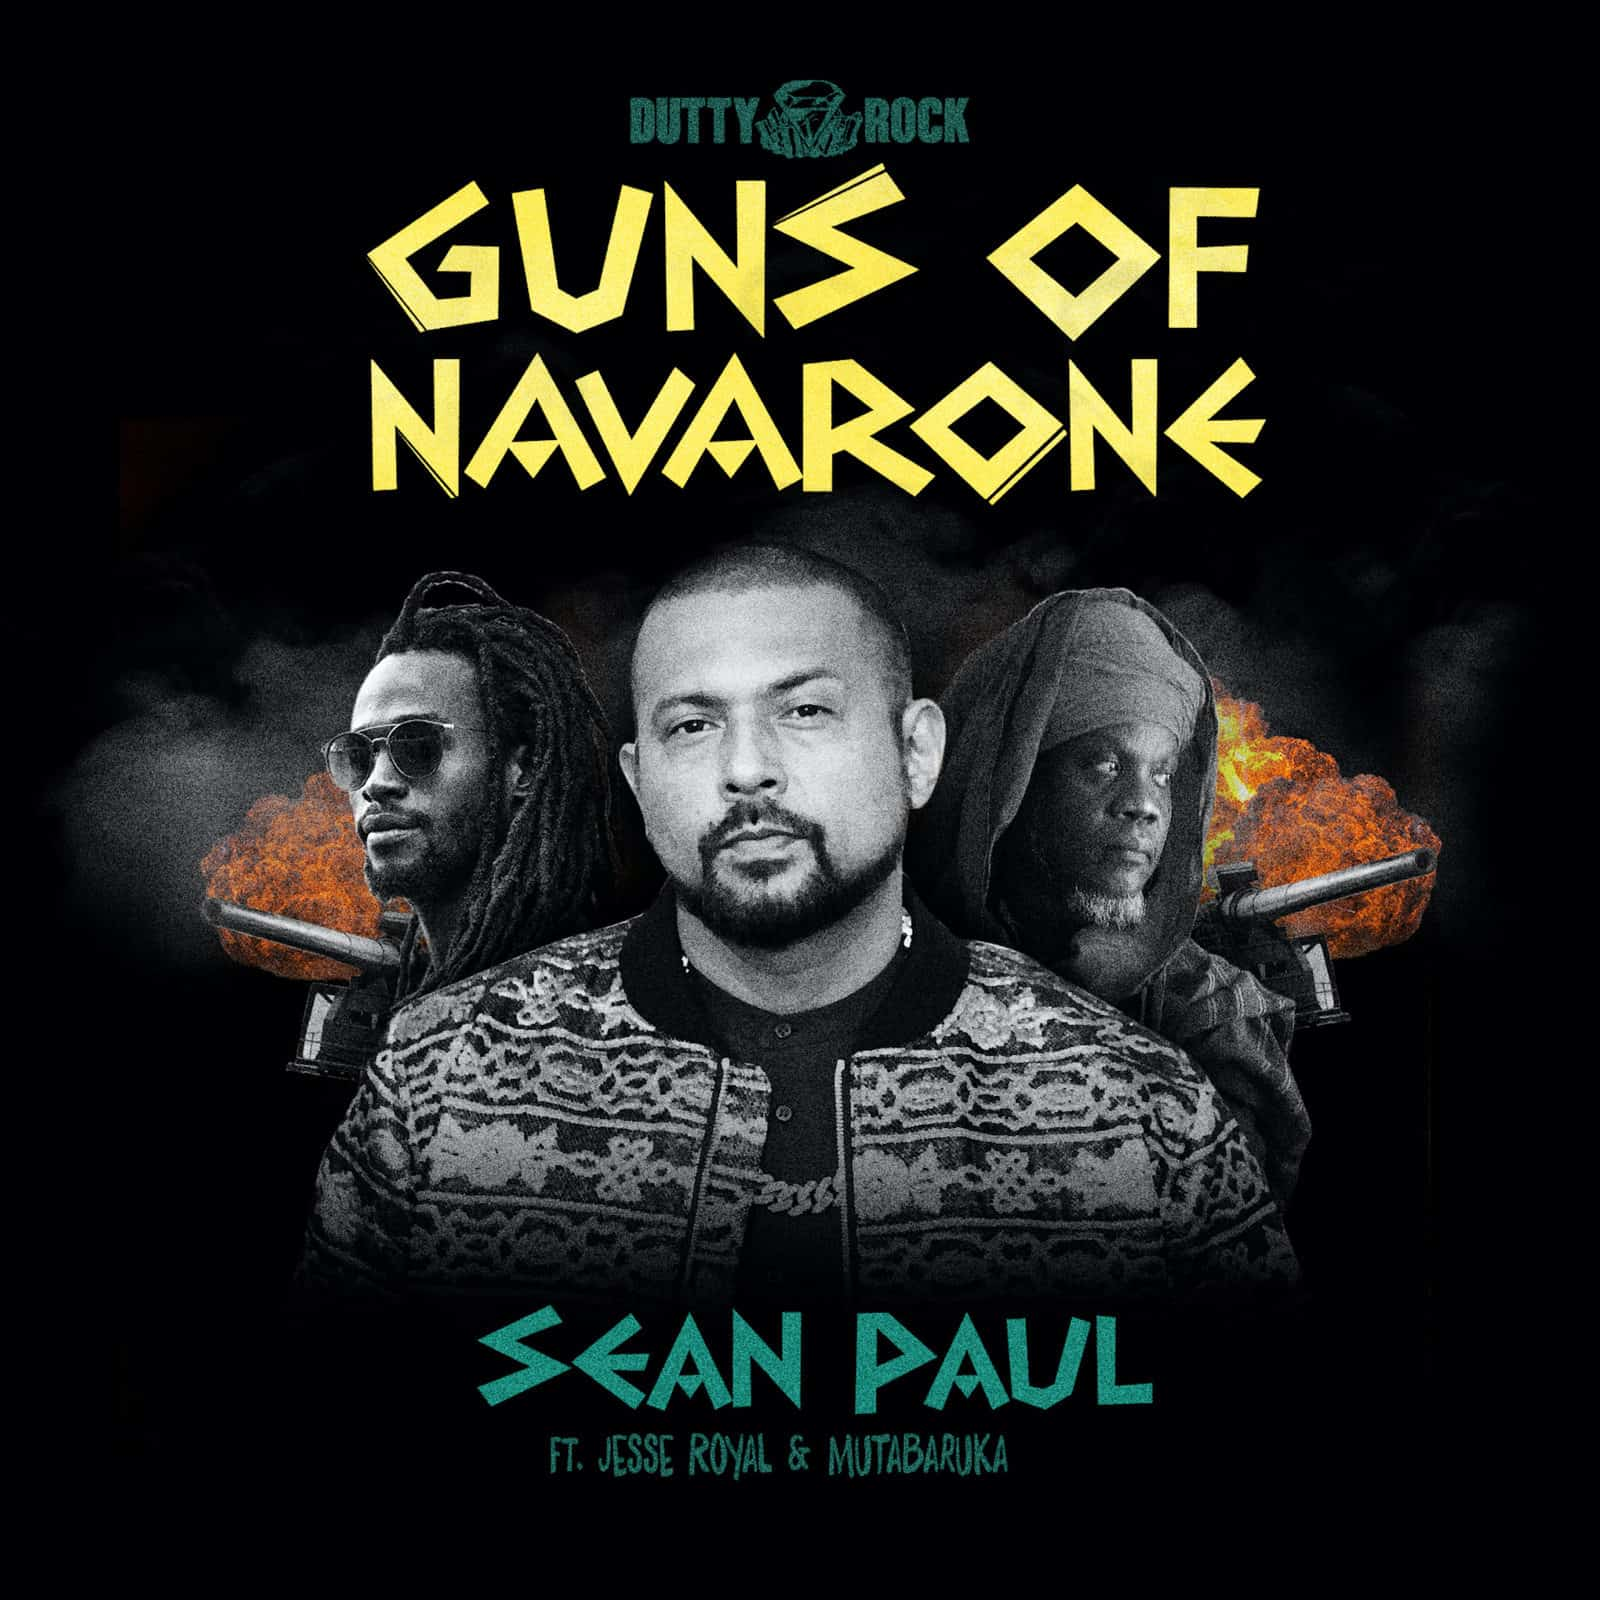 Sean Paul feat Jesse Royal and Mutabaruka - Guns of Navarone